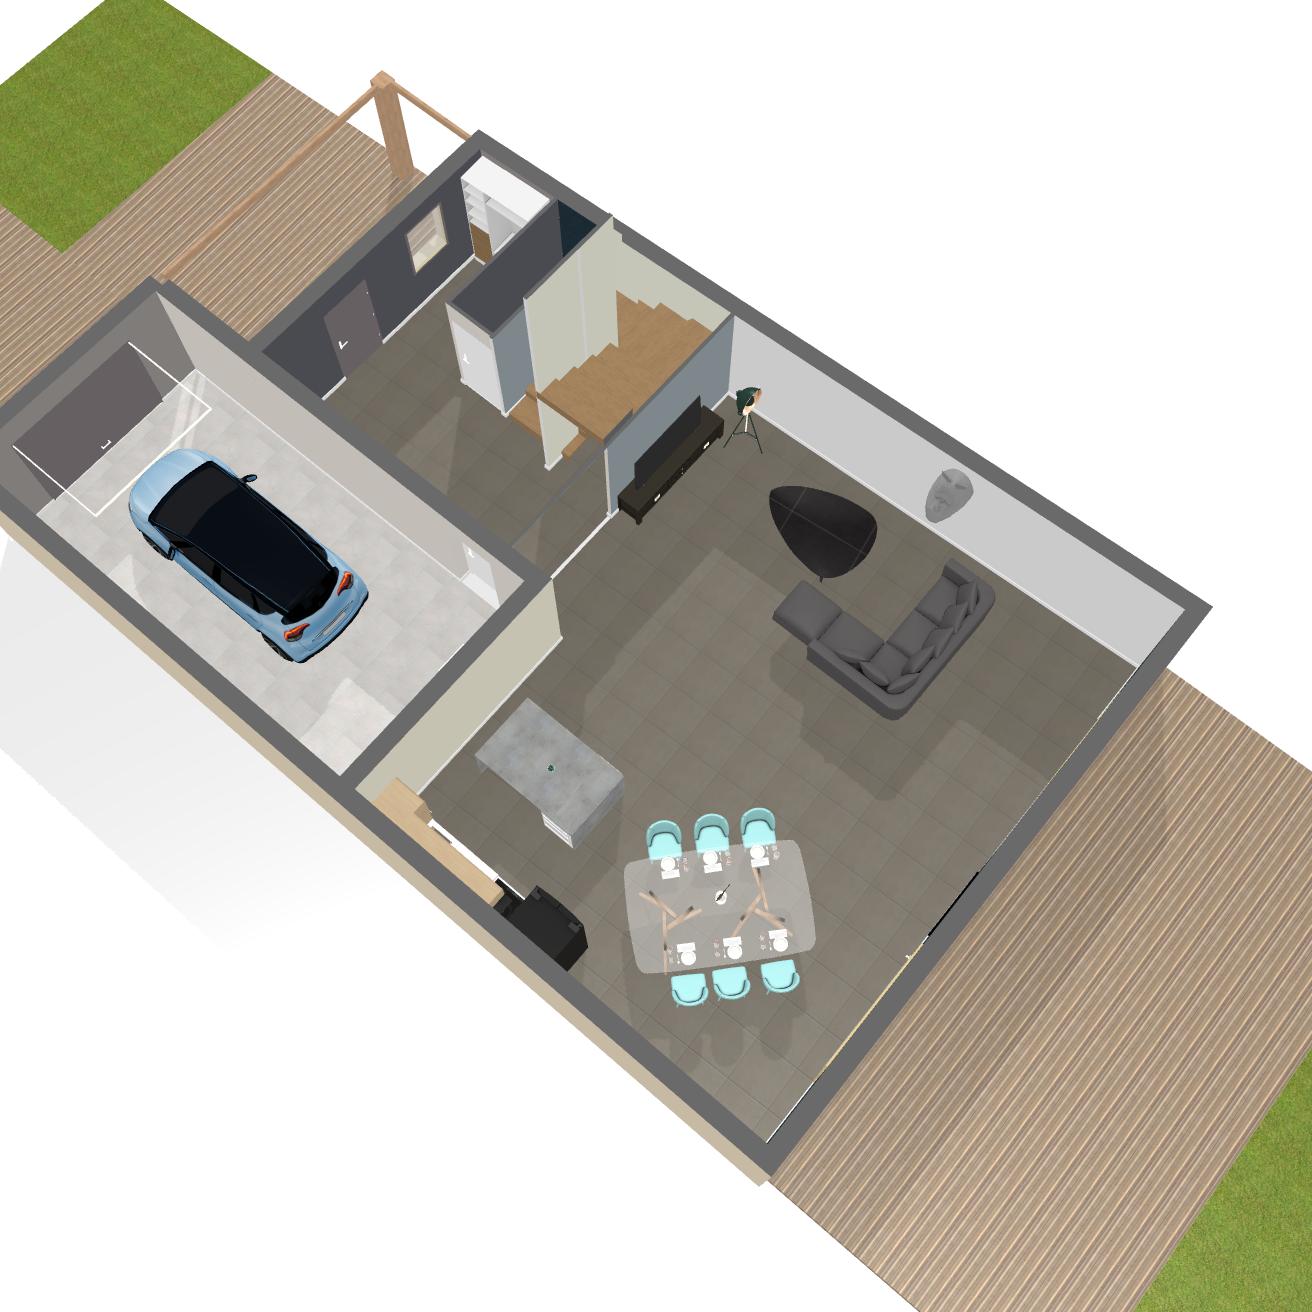 AZELOT : MAISON NEUVE 110 m²